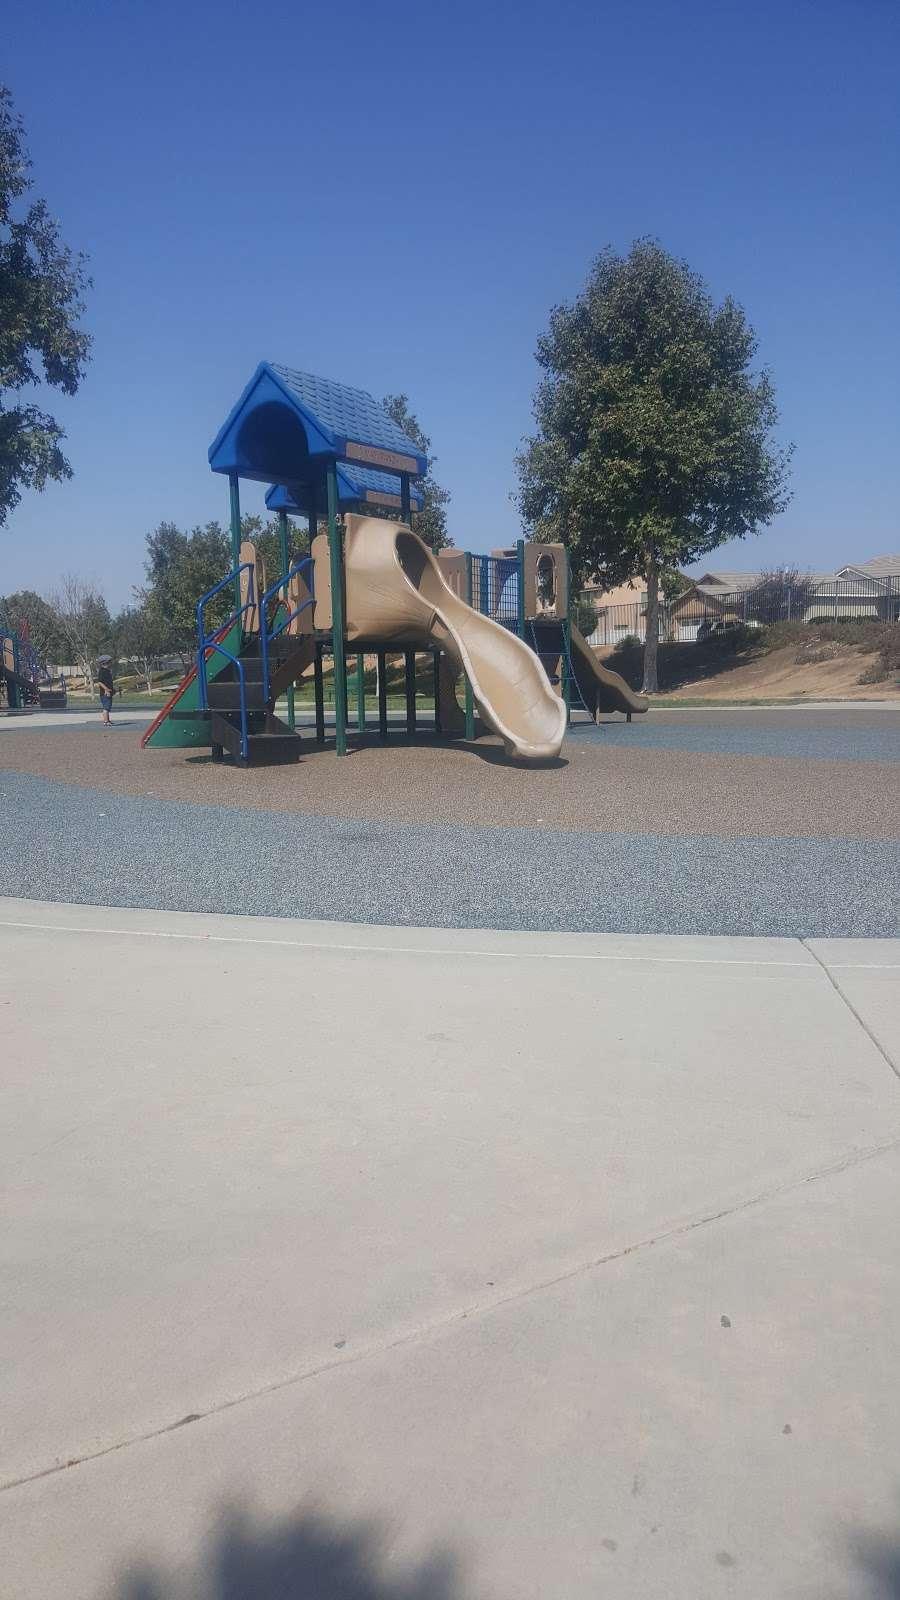 Basin Park - park    Photo 9 of 10   Address: 20160 Evans Rd, Perris, CA 92571, USA